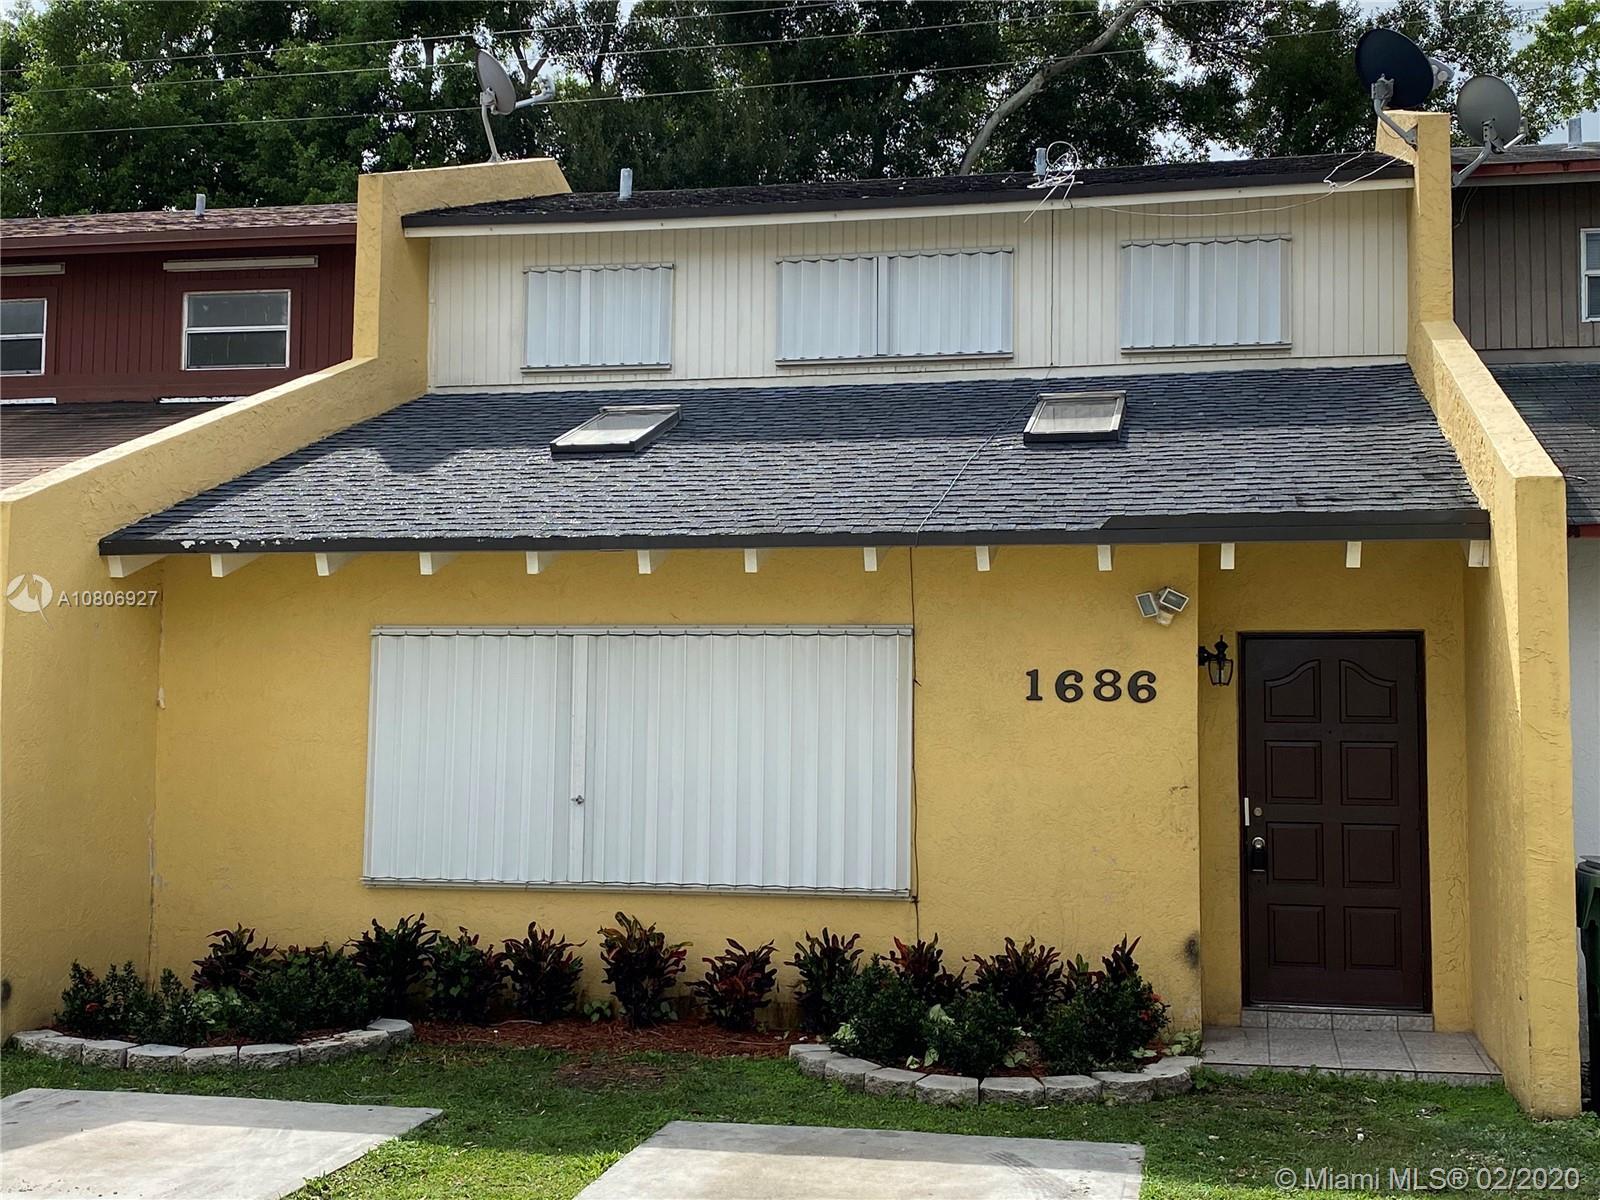 1686 Sunrise Blvd, Homestead, FL 33033 - Homestead, FL real estate listing